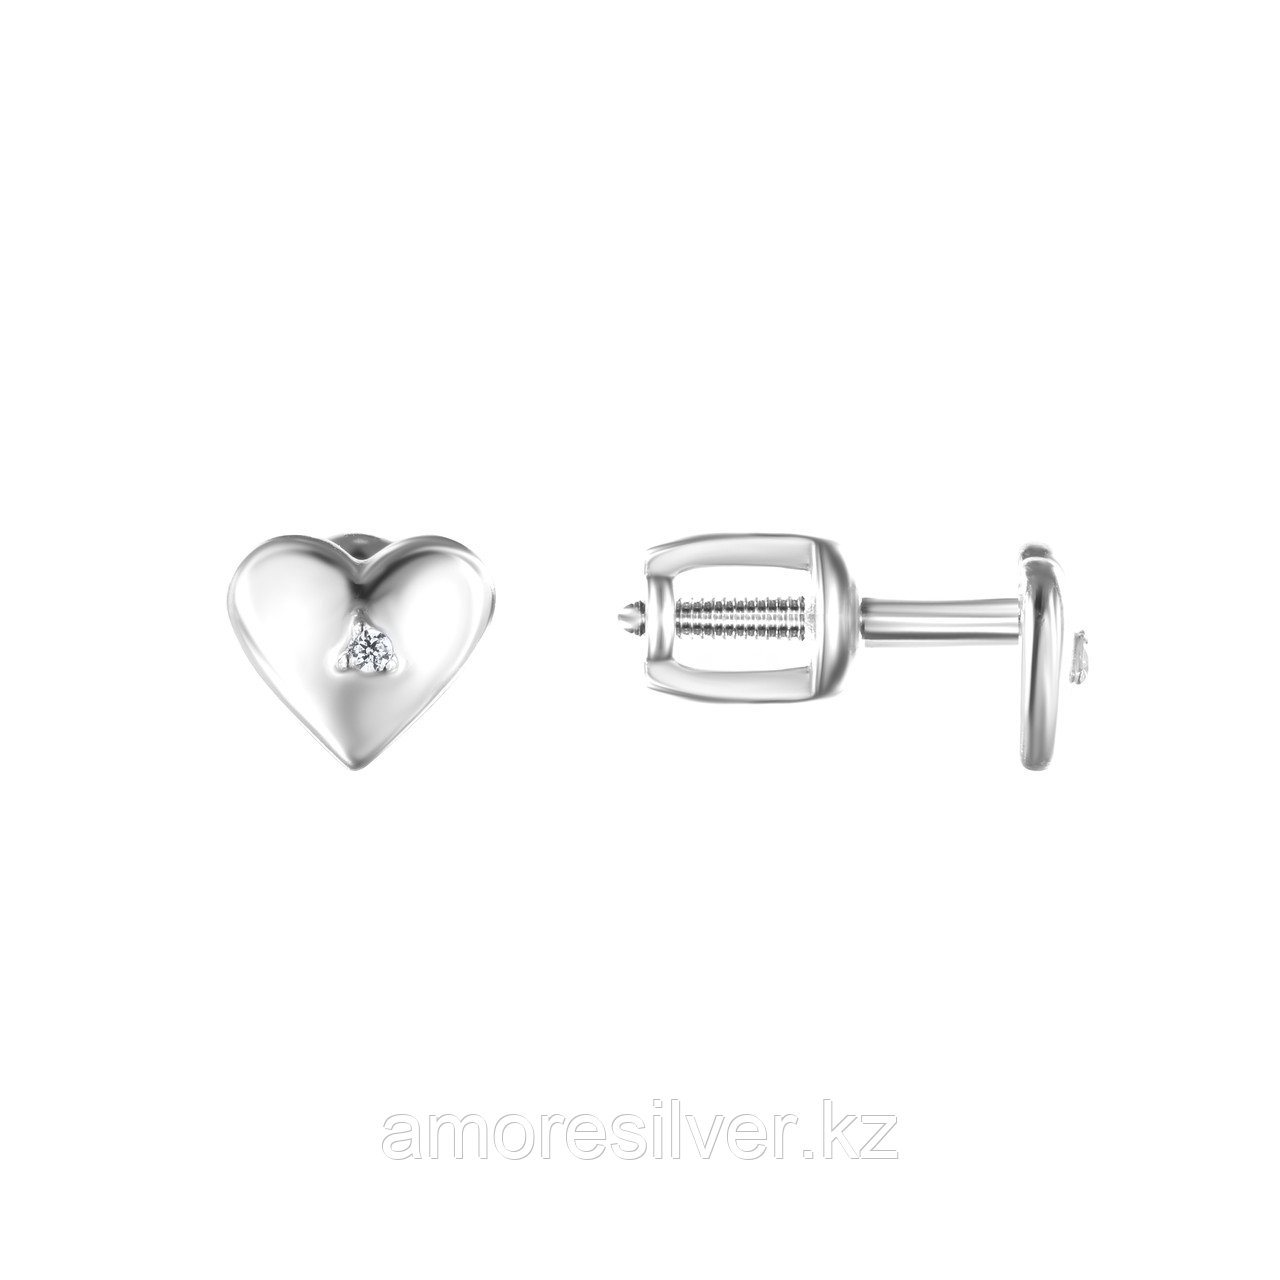 Серьги TEOSA серебро с родием, фианит, love 10219-0596-CZ - фото 1